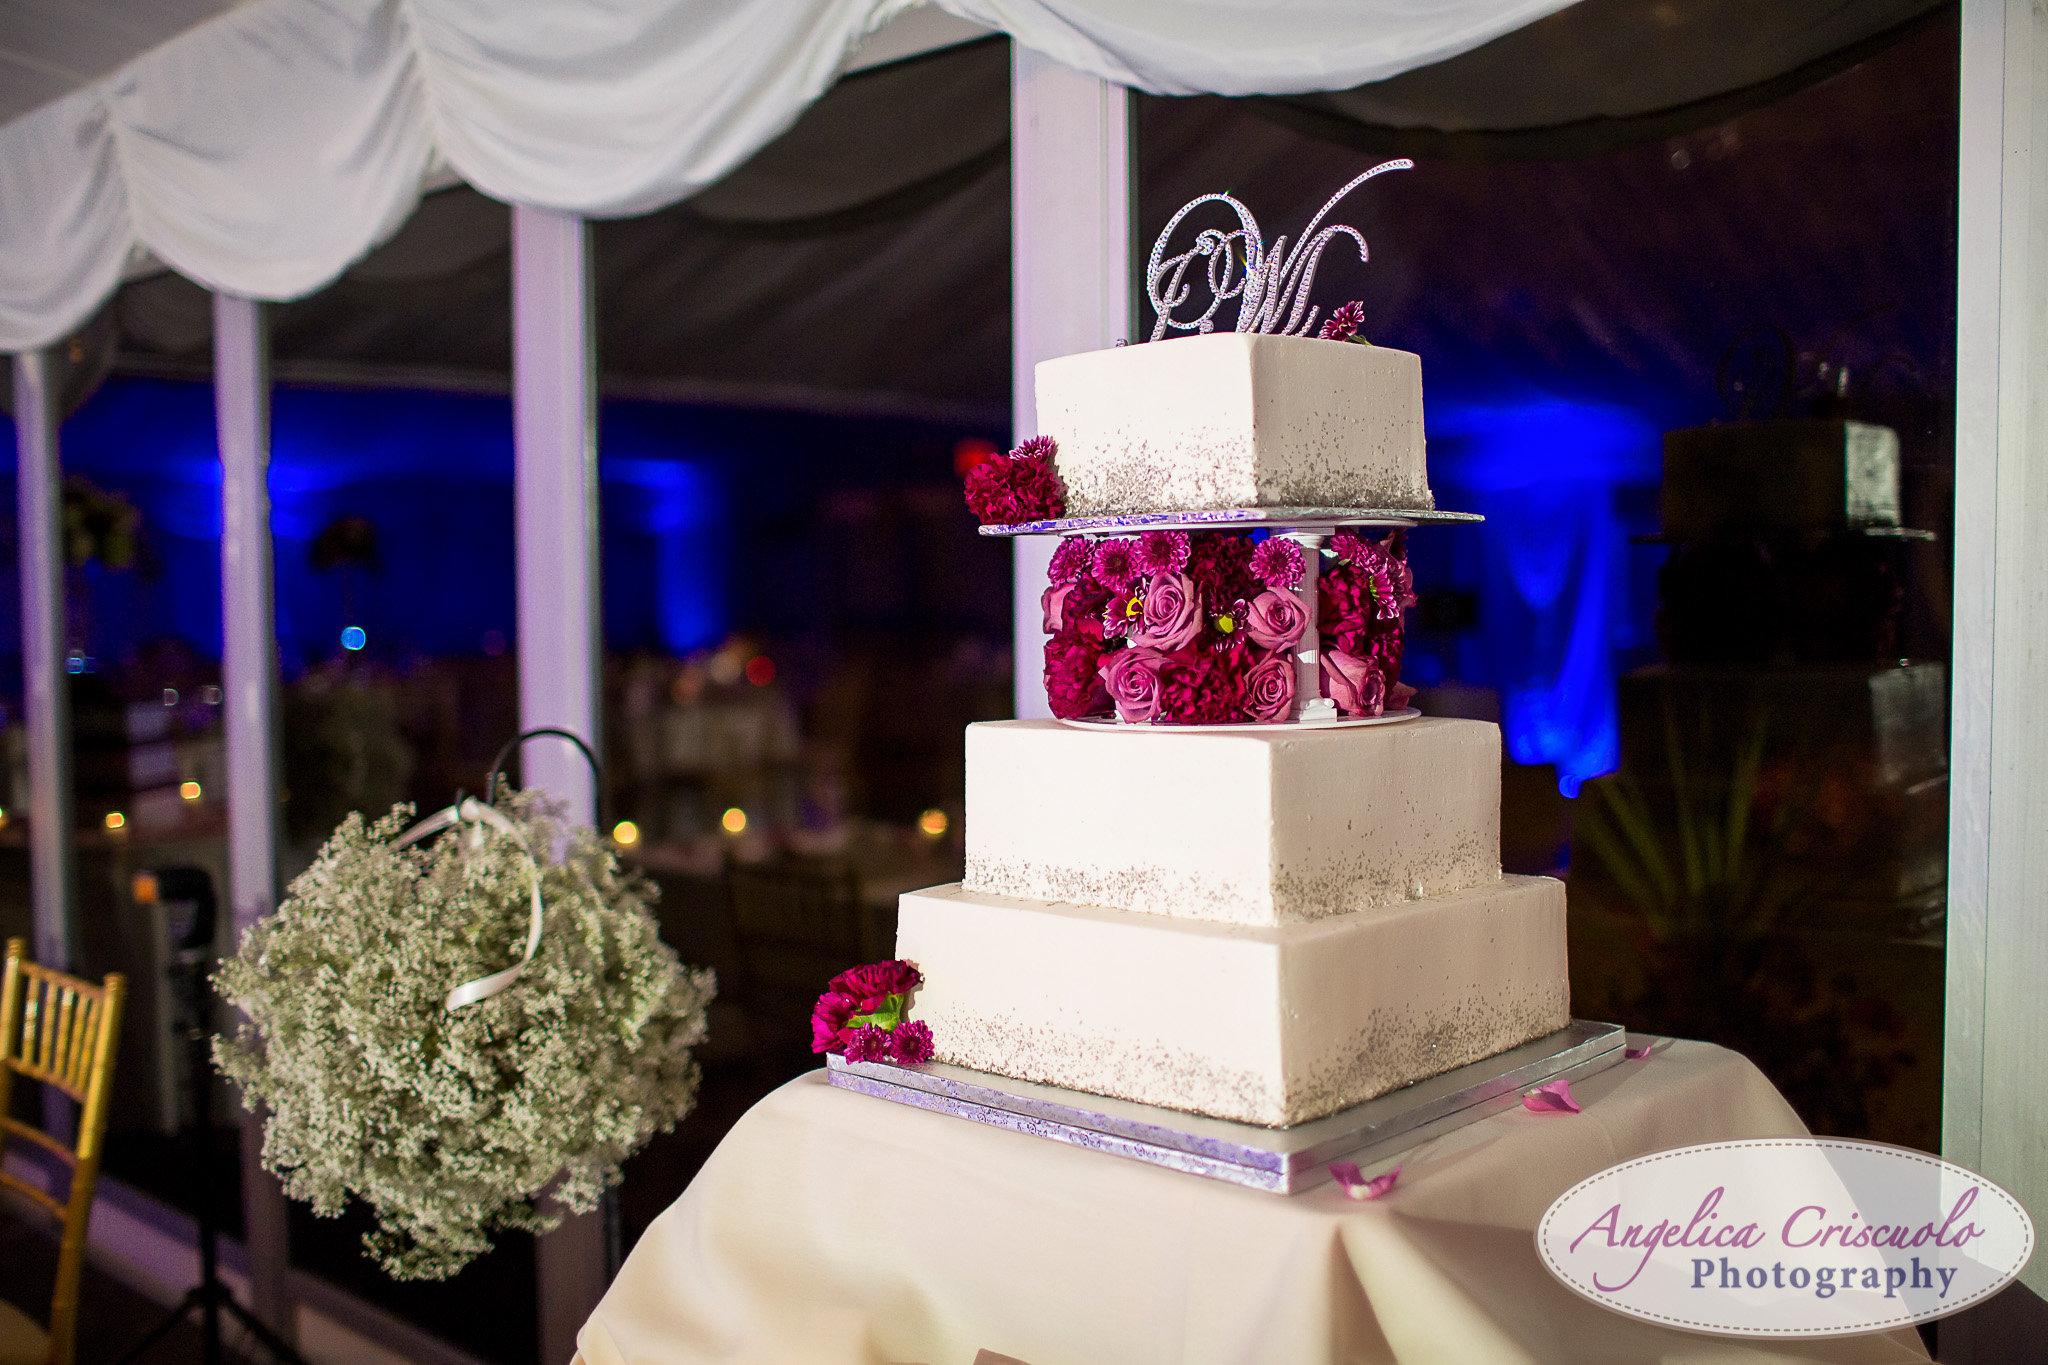 Conti's Pastry Shop wedding cake New York Wedding photographer pelham bay split Rock Golf Courses